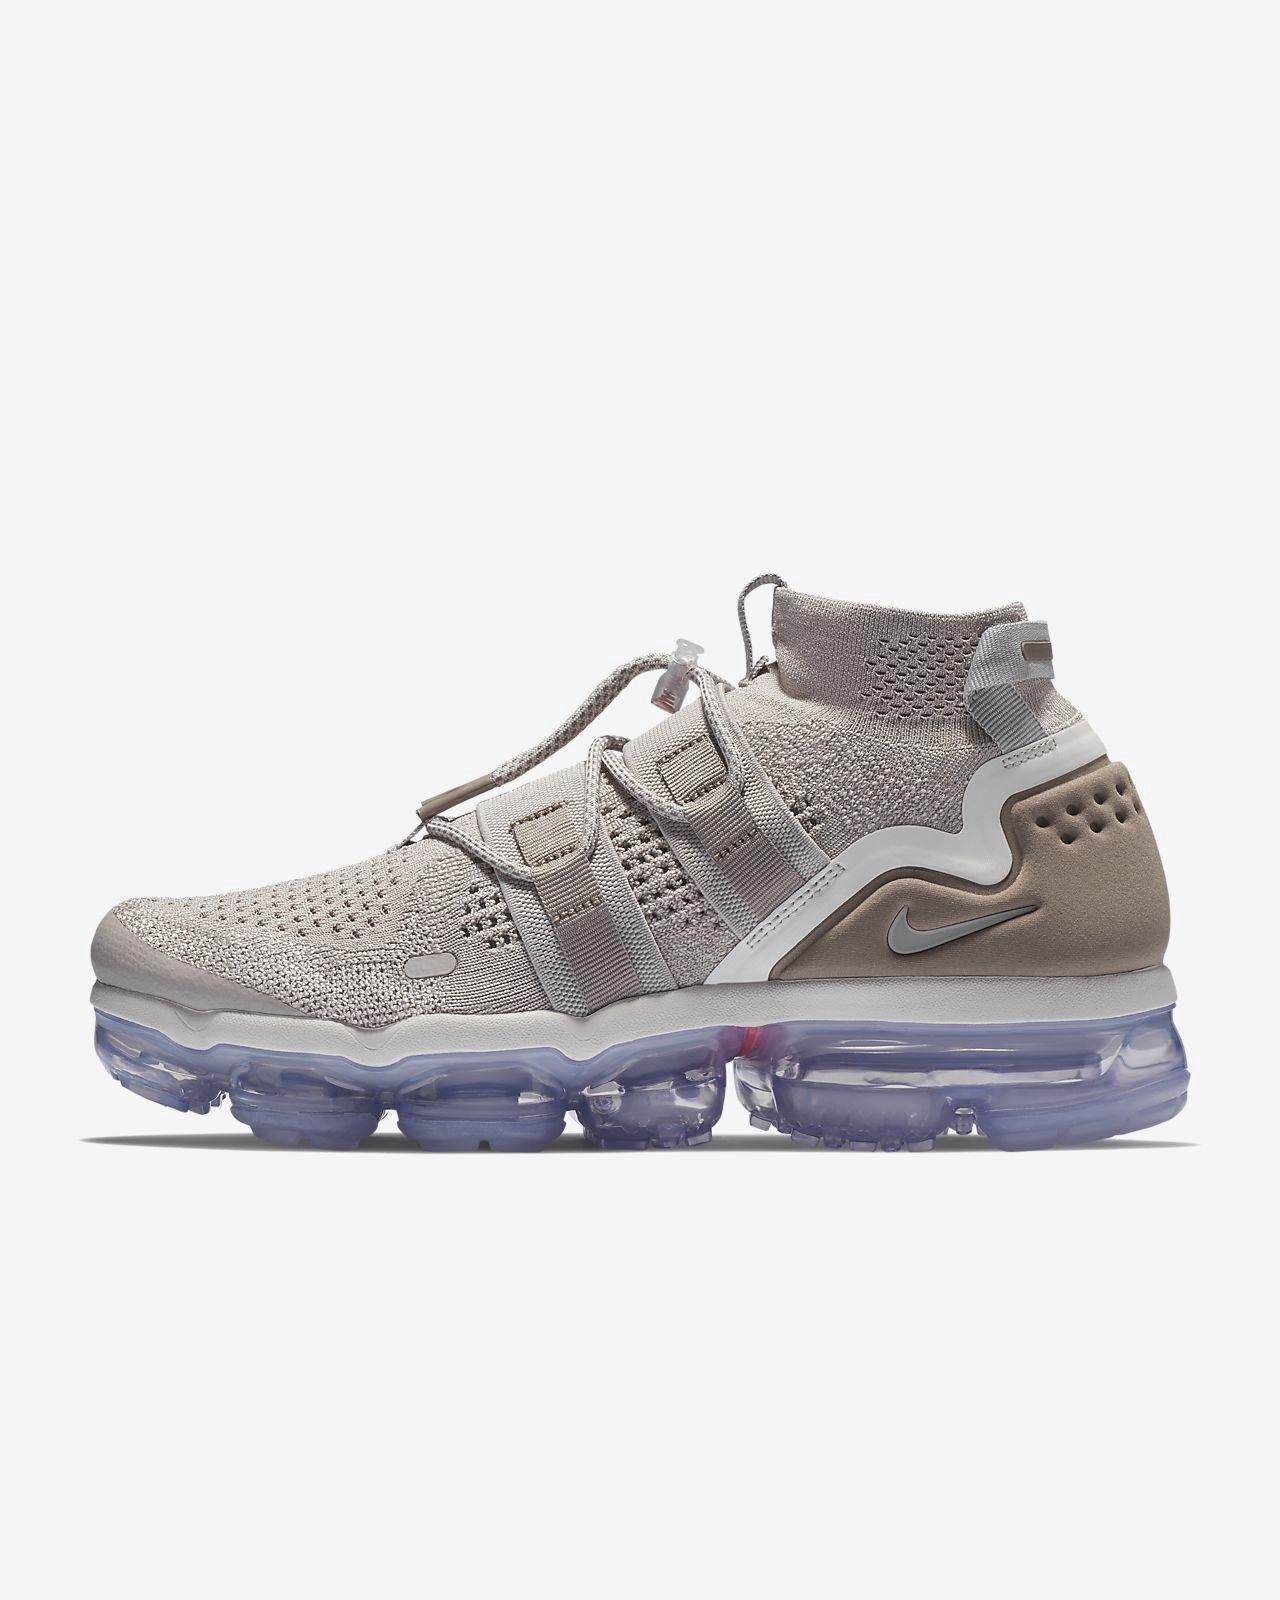 a190cd4b4db5b0 Casual Shoes For Men. Nike Air Vapormax Flyknit Utility Running Shoe - M 14    W 15.5